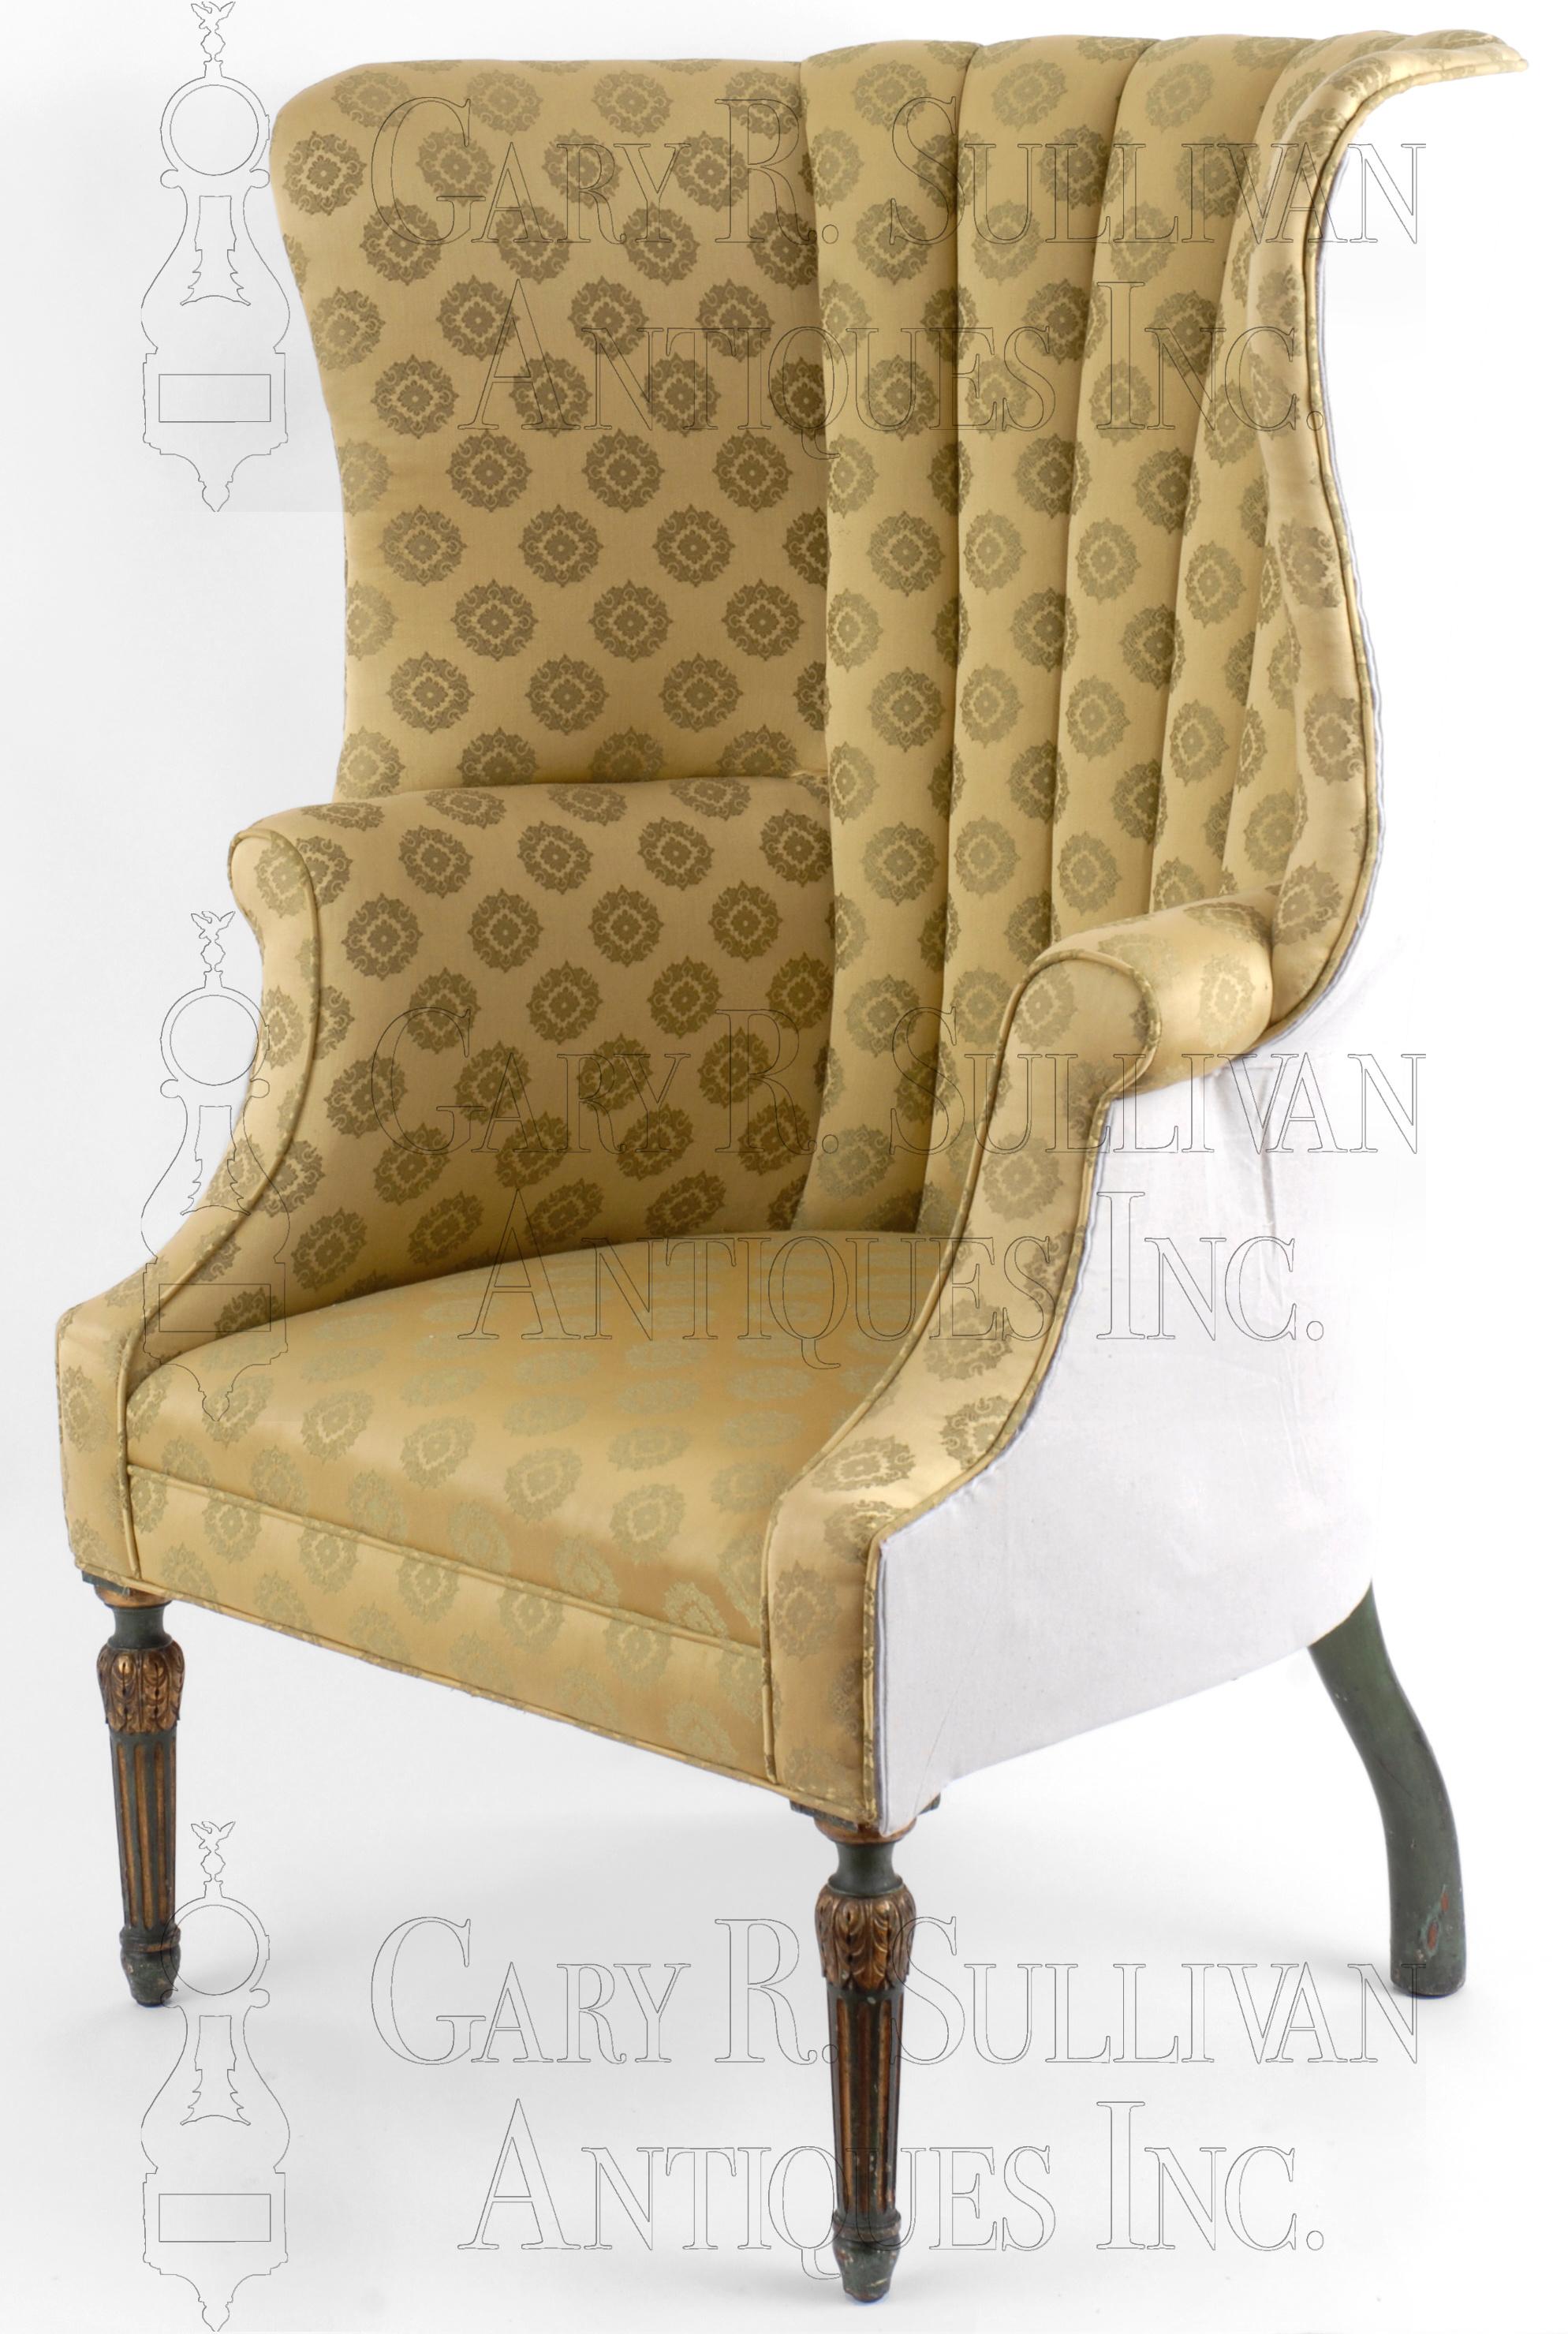 Barrel Back Easy Chair Philadelphia Pa Furniture 08045 Gary Sullivan Antiques Antique Clock Dealer Antique Furniture Expert